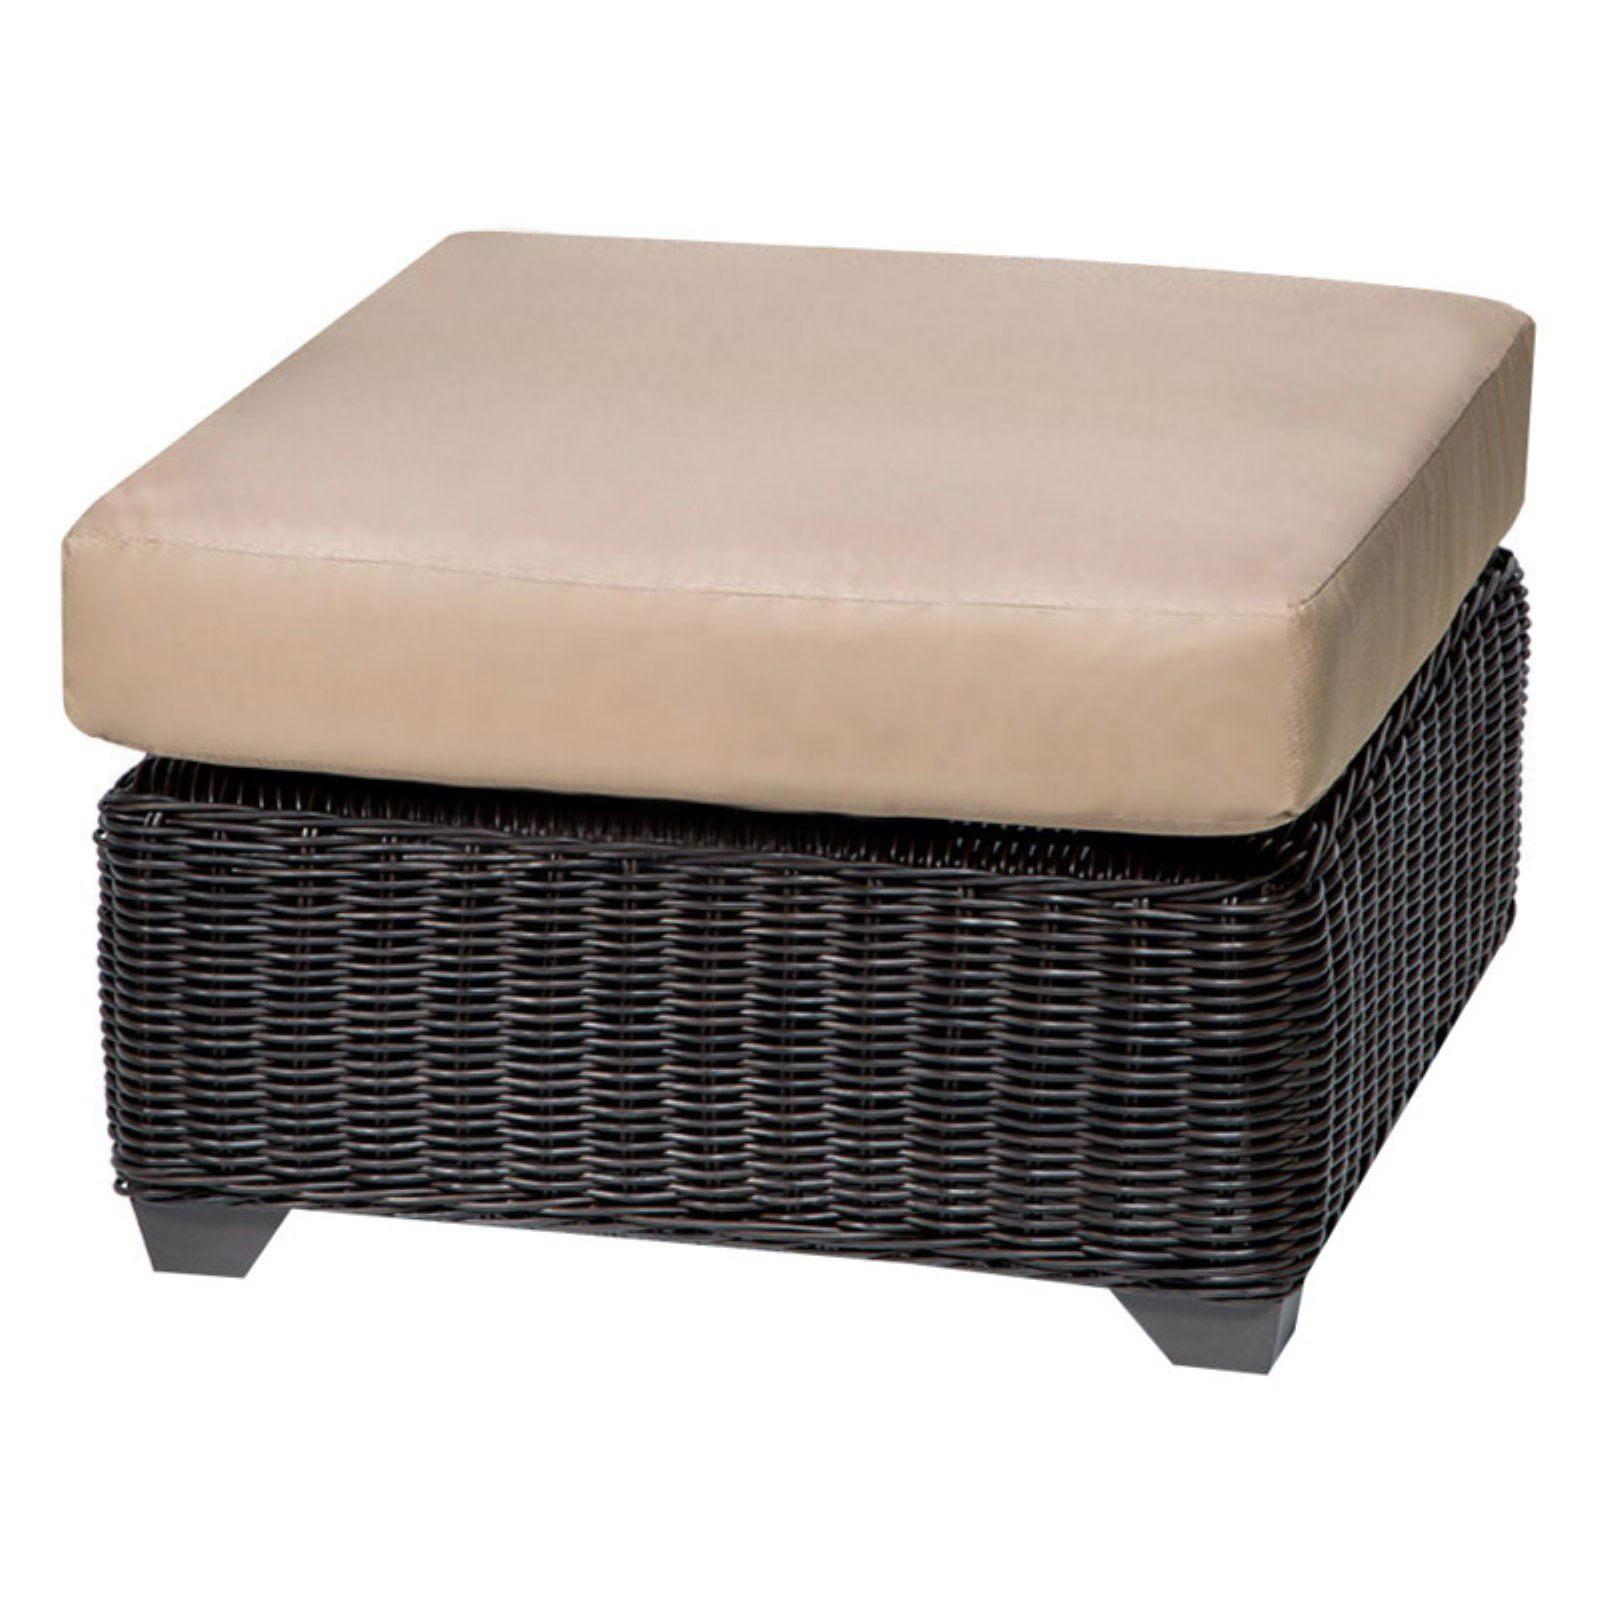 TK Classics Venice Wicker Outdoor Ottoman - Set of 2 Cushion Covers